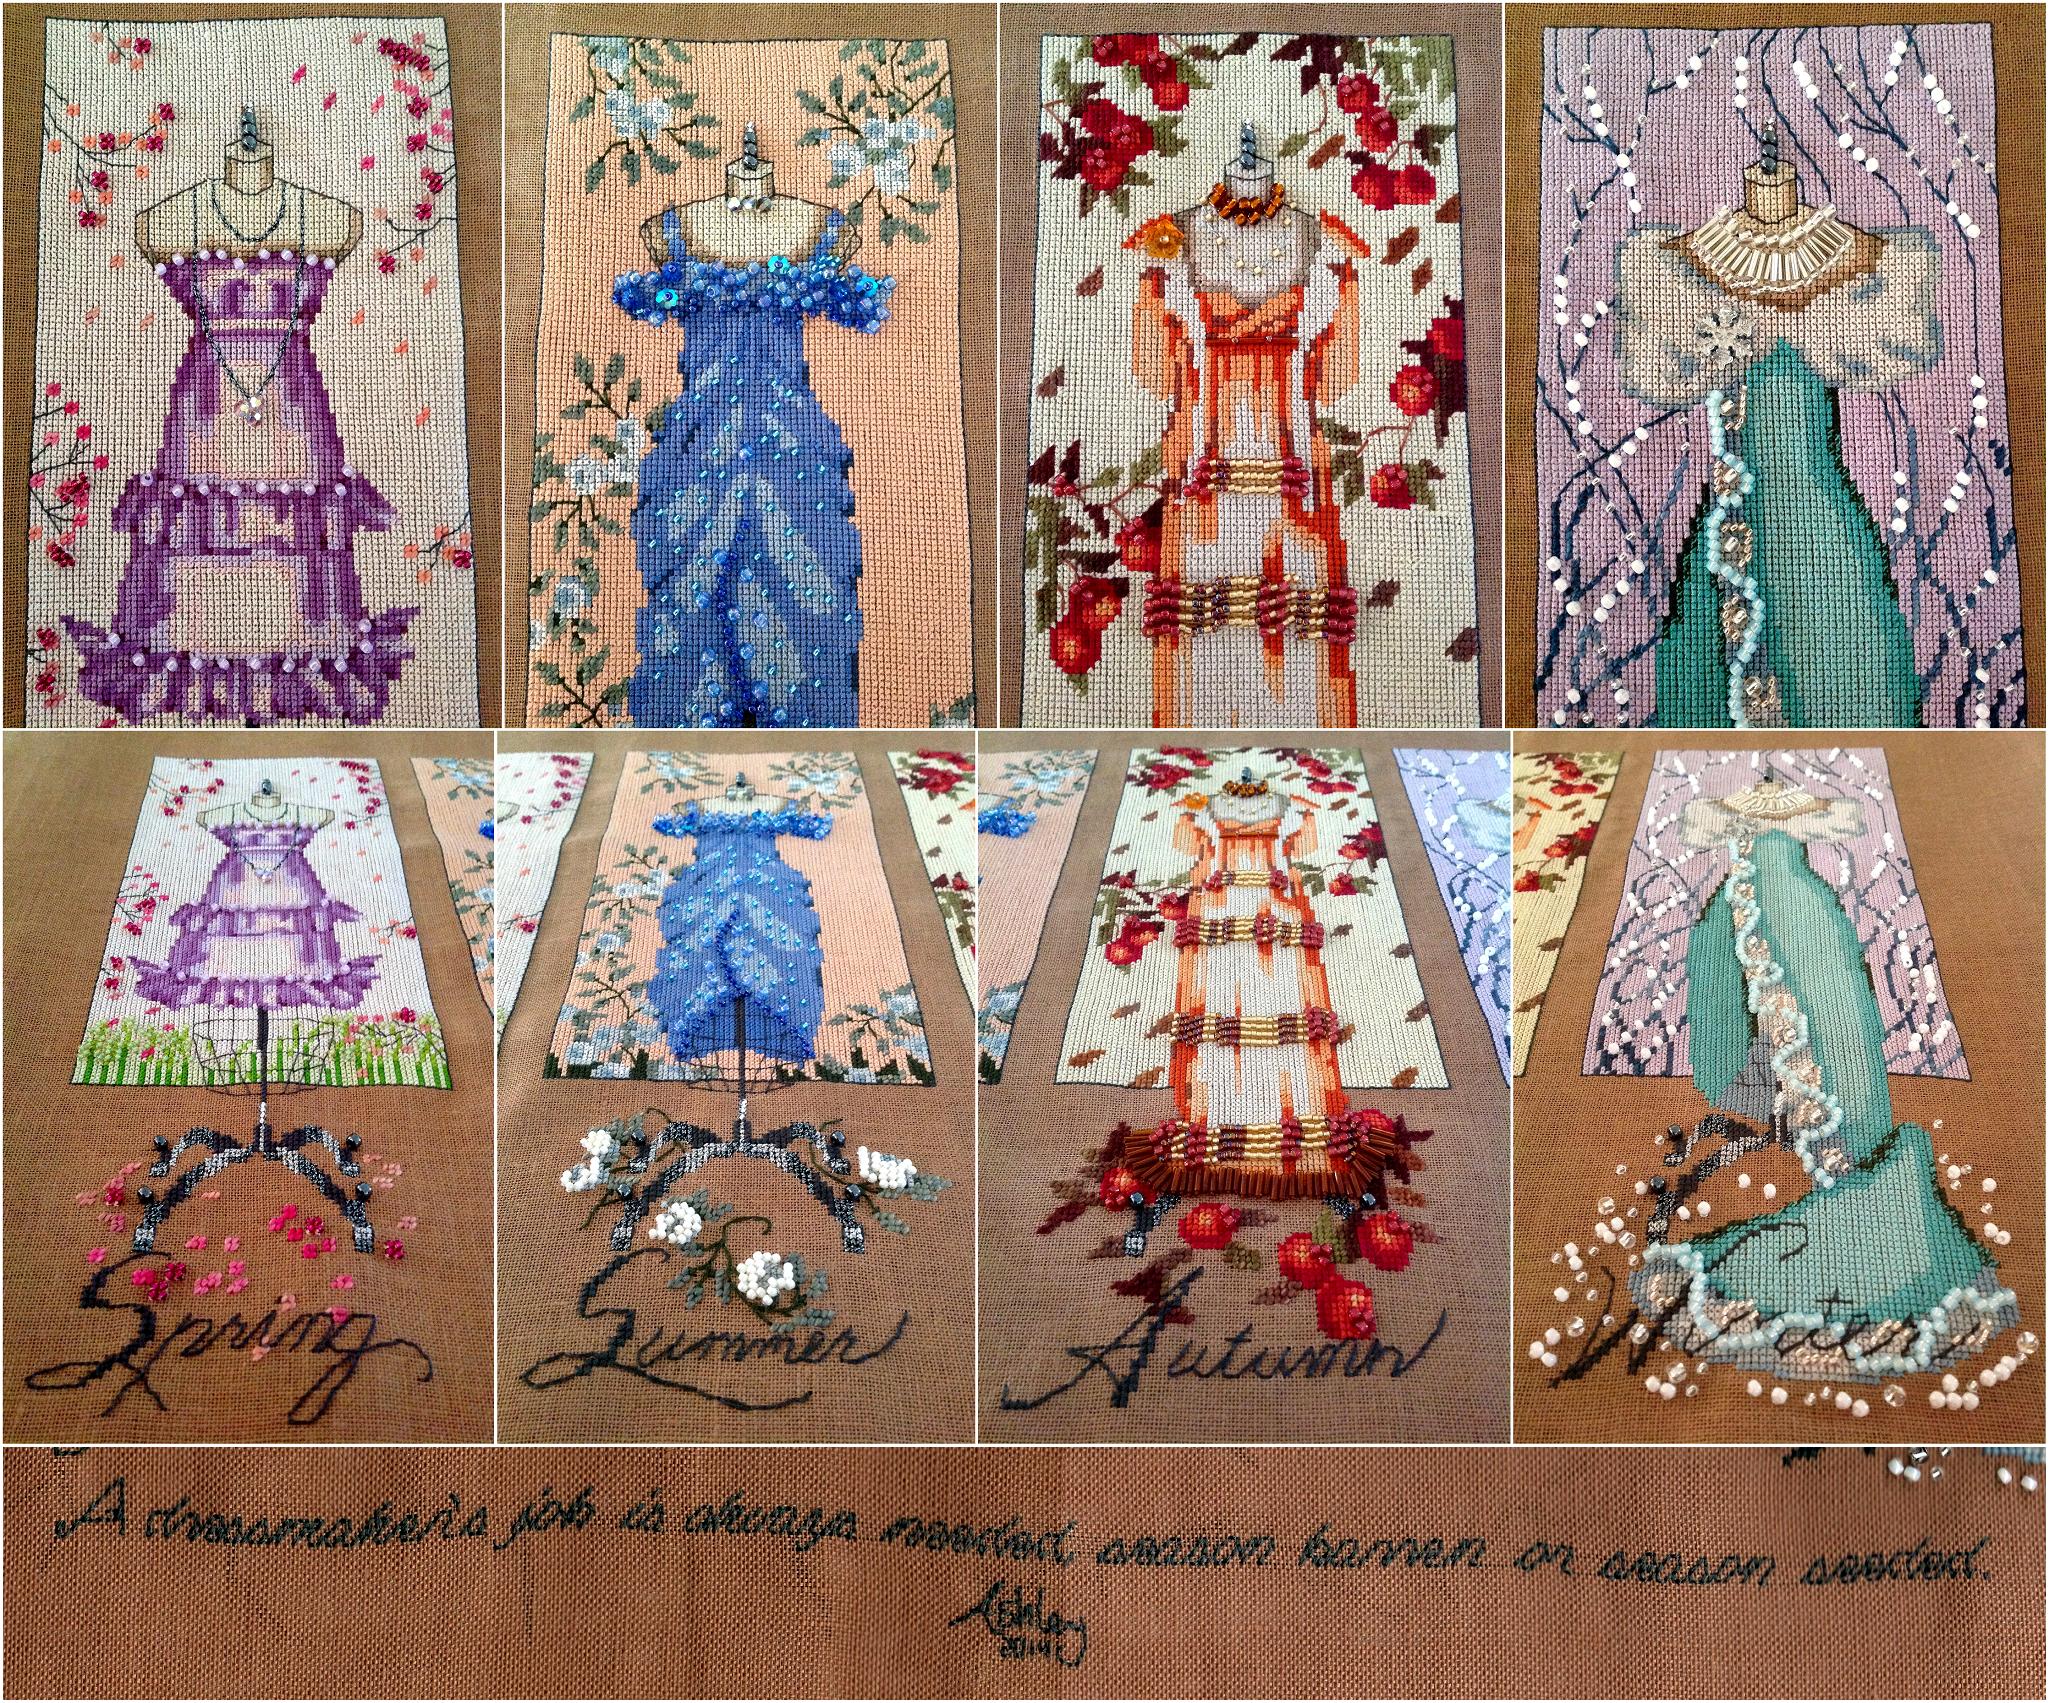 Mirabilia's Dressmaker's Daughter